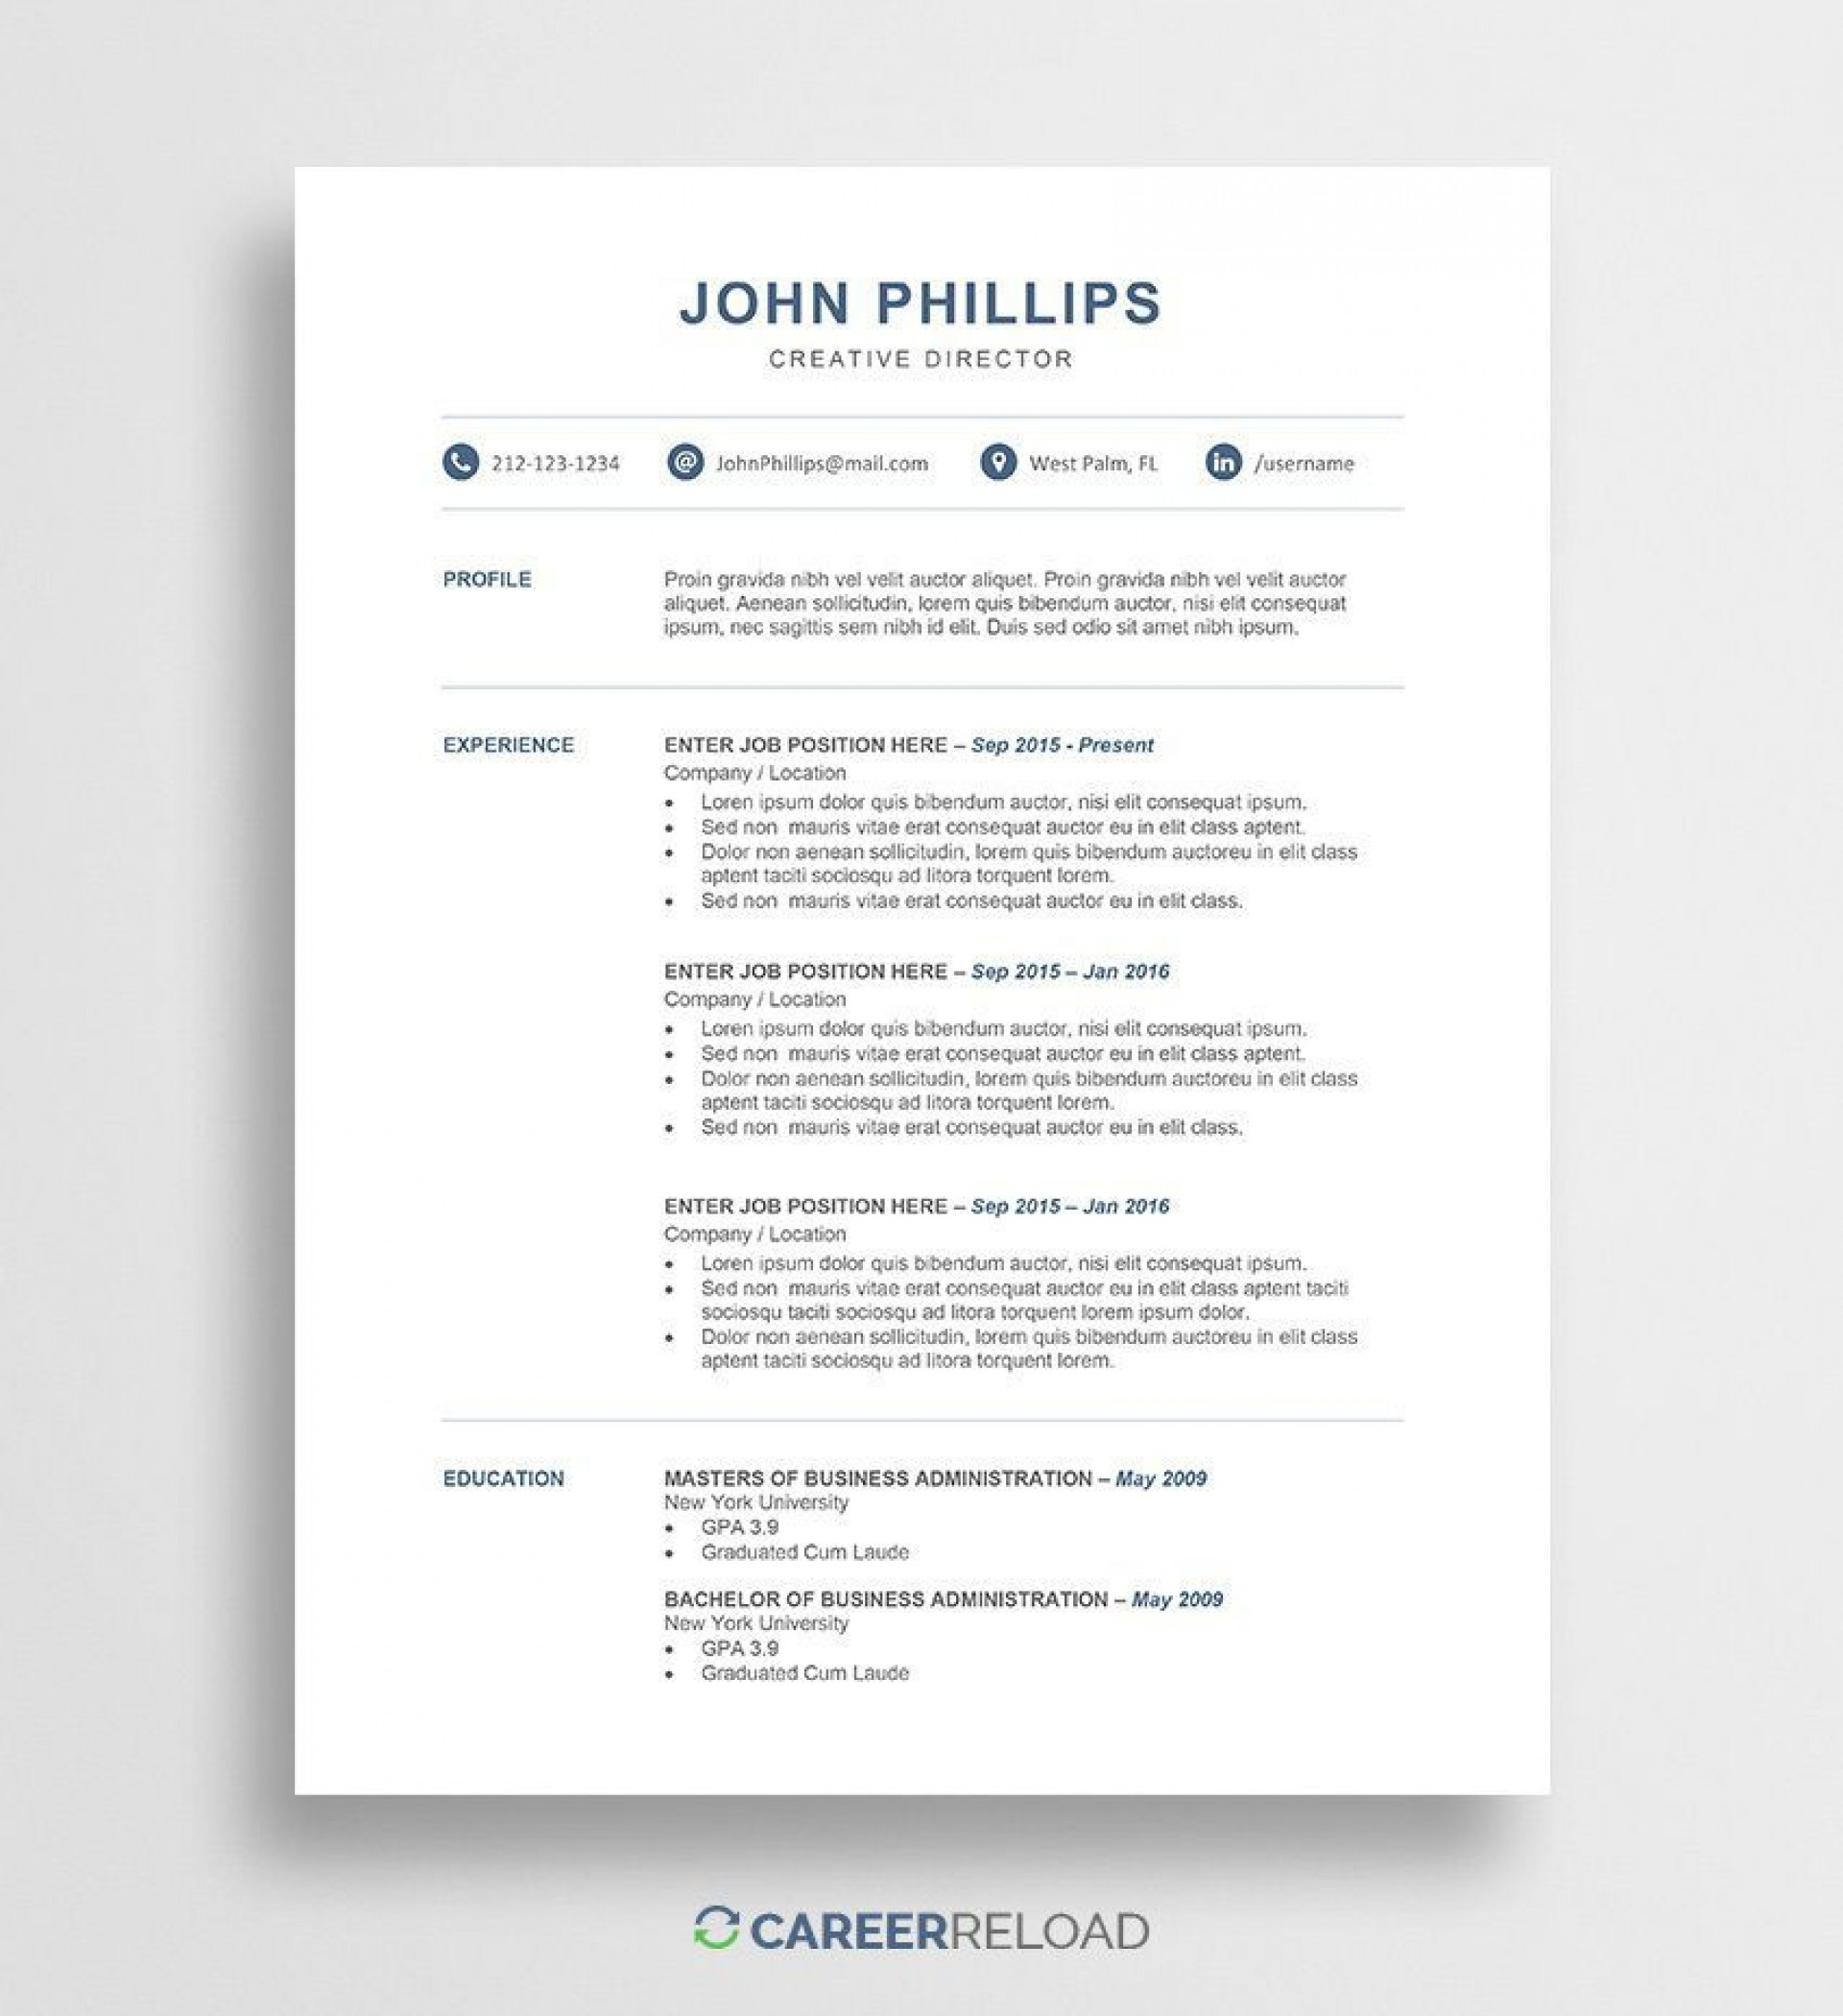 010 Stupendou Download Resume Example Free  Hr Sample Visual Cv1920